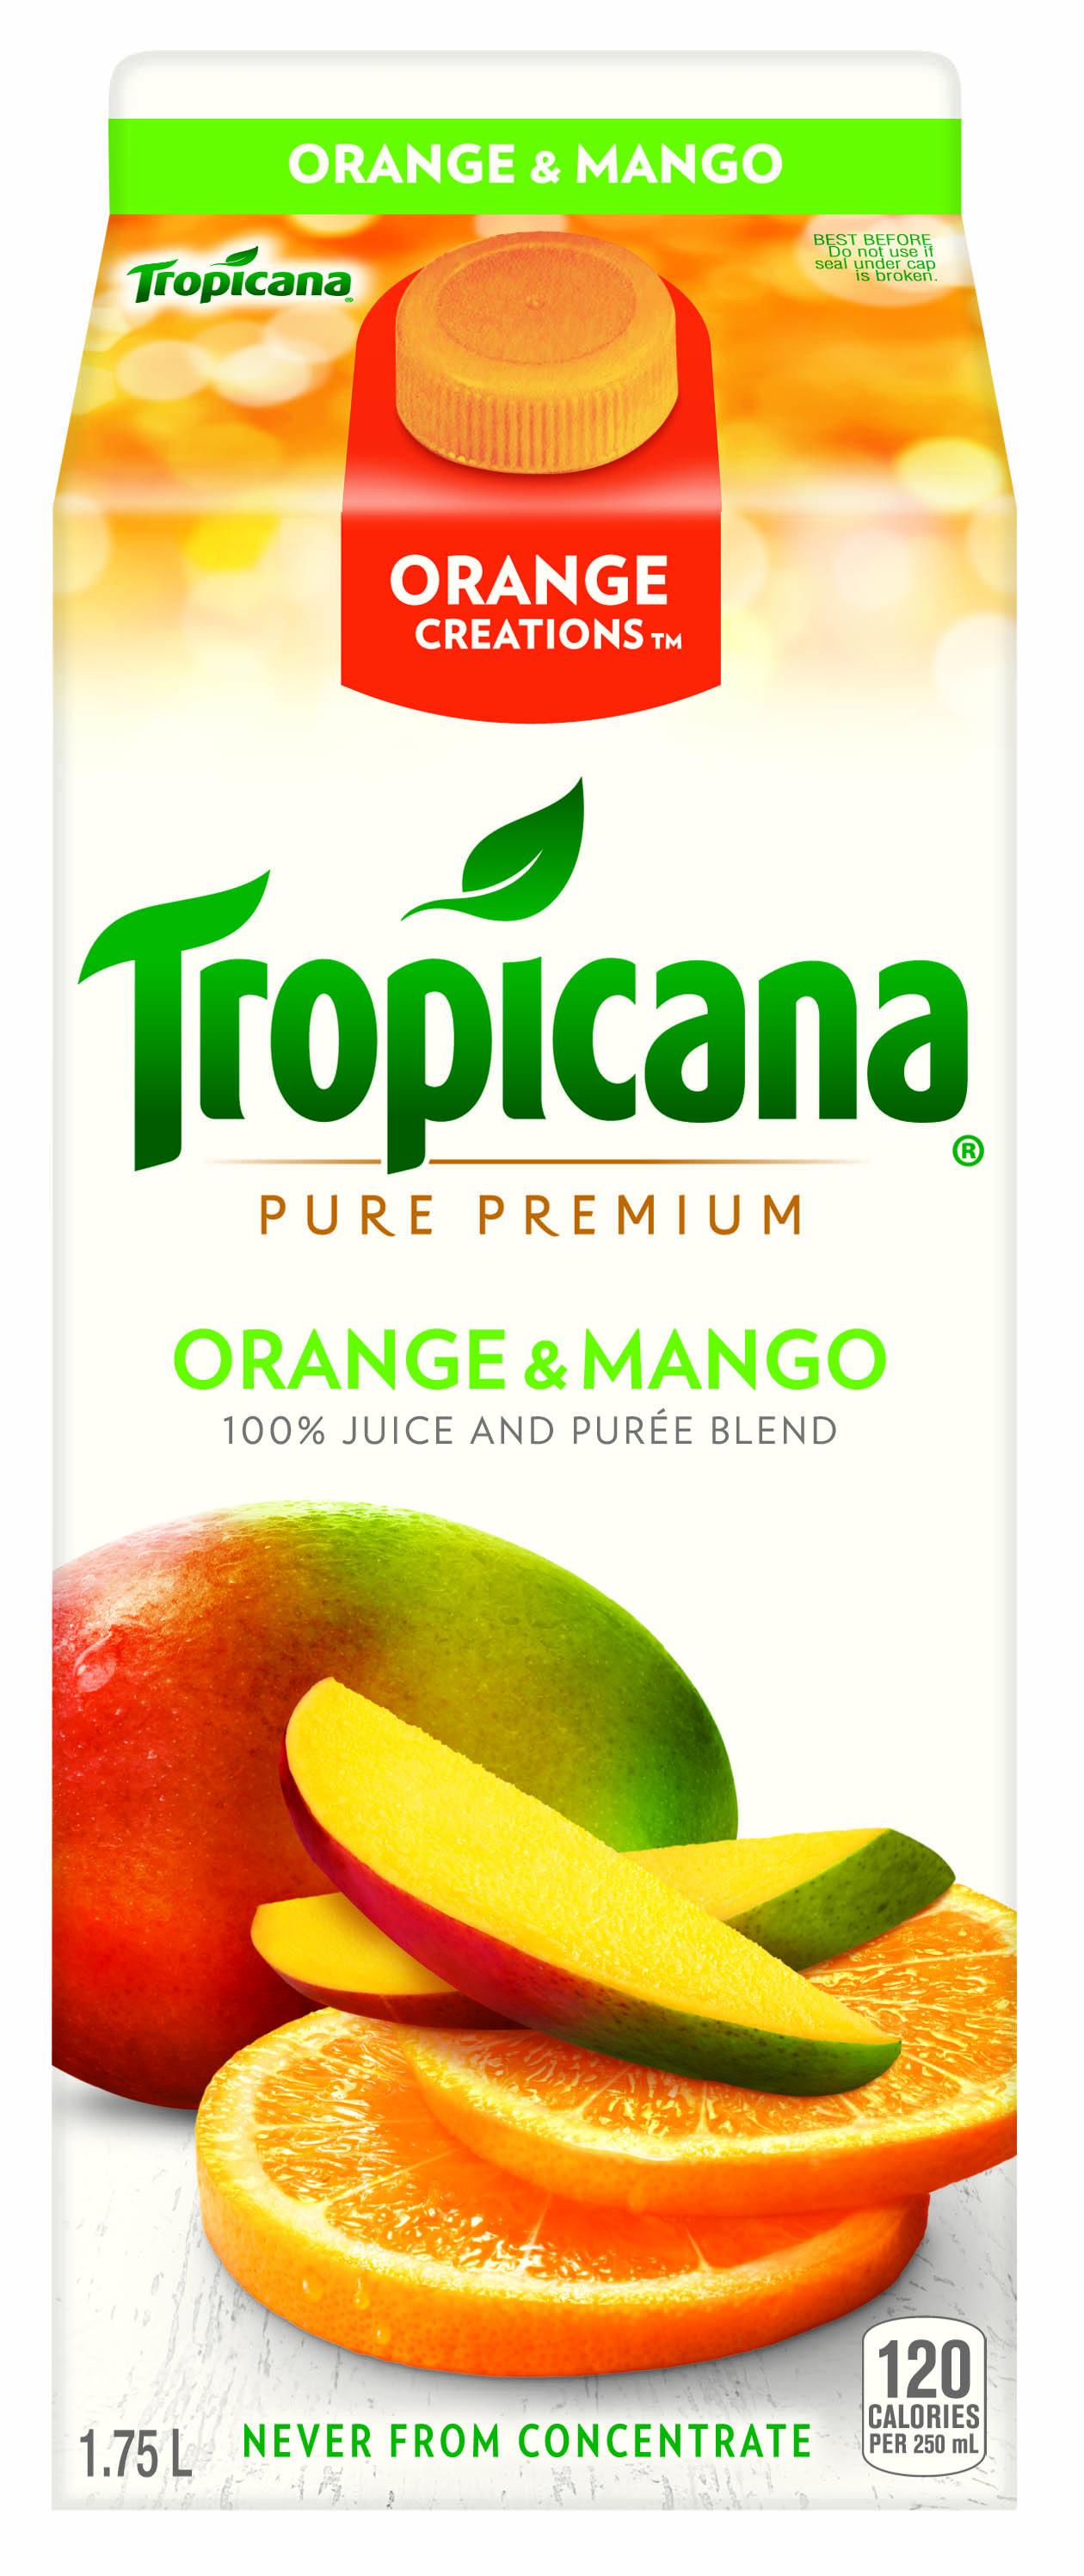 Tropicana® Orange Creations™ – Orange & Mango